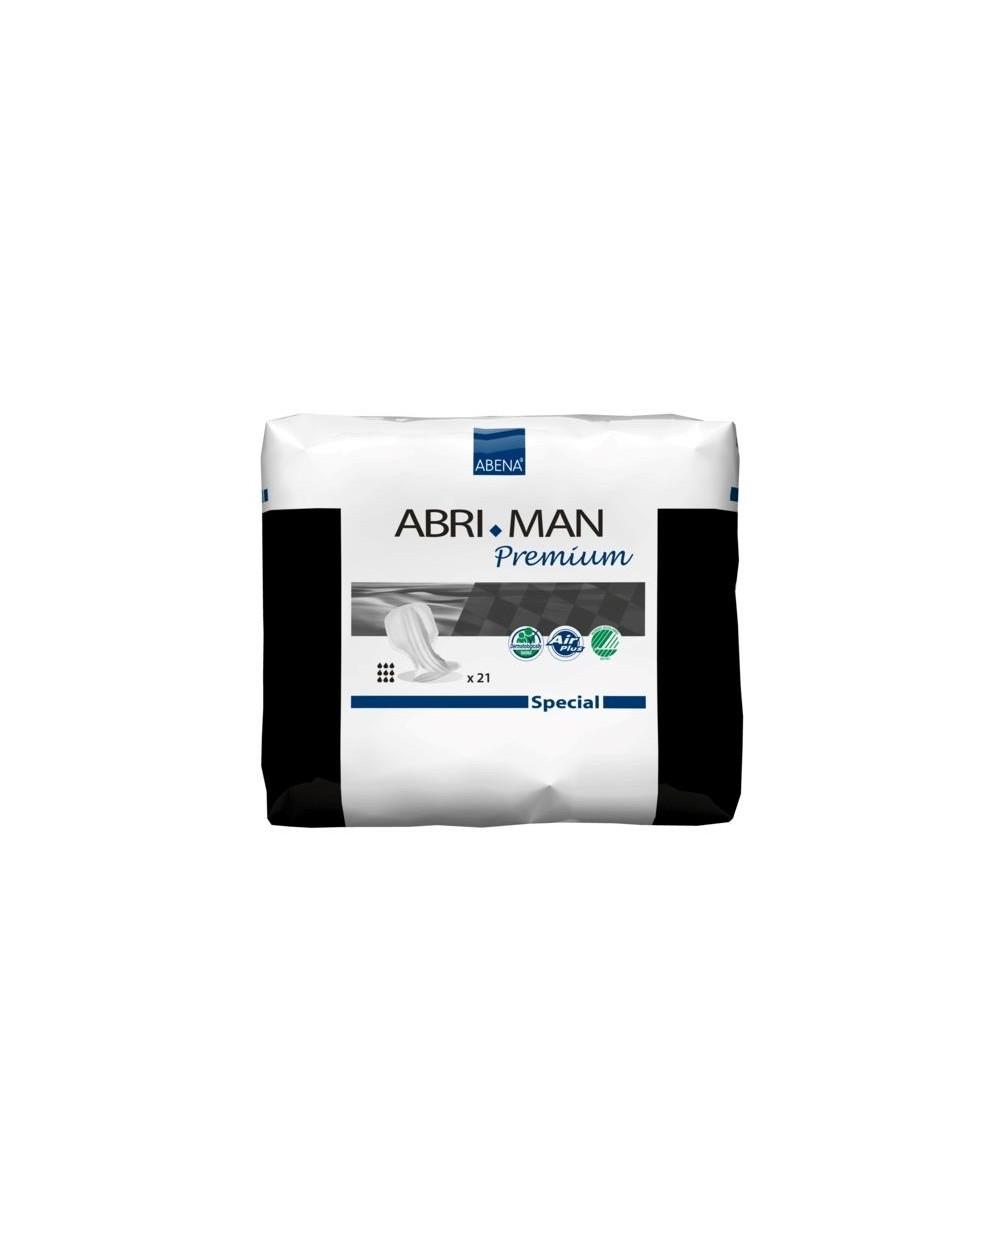 ABENA Abri-Man Special - 21 protections